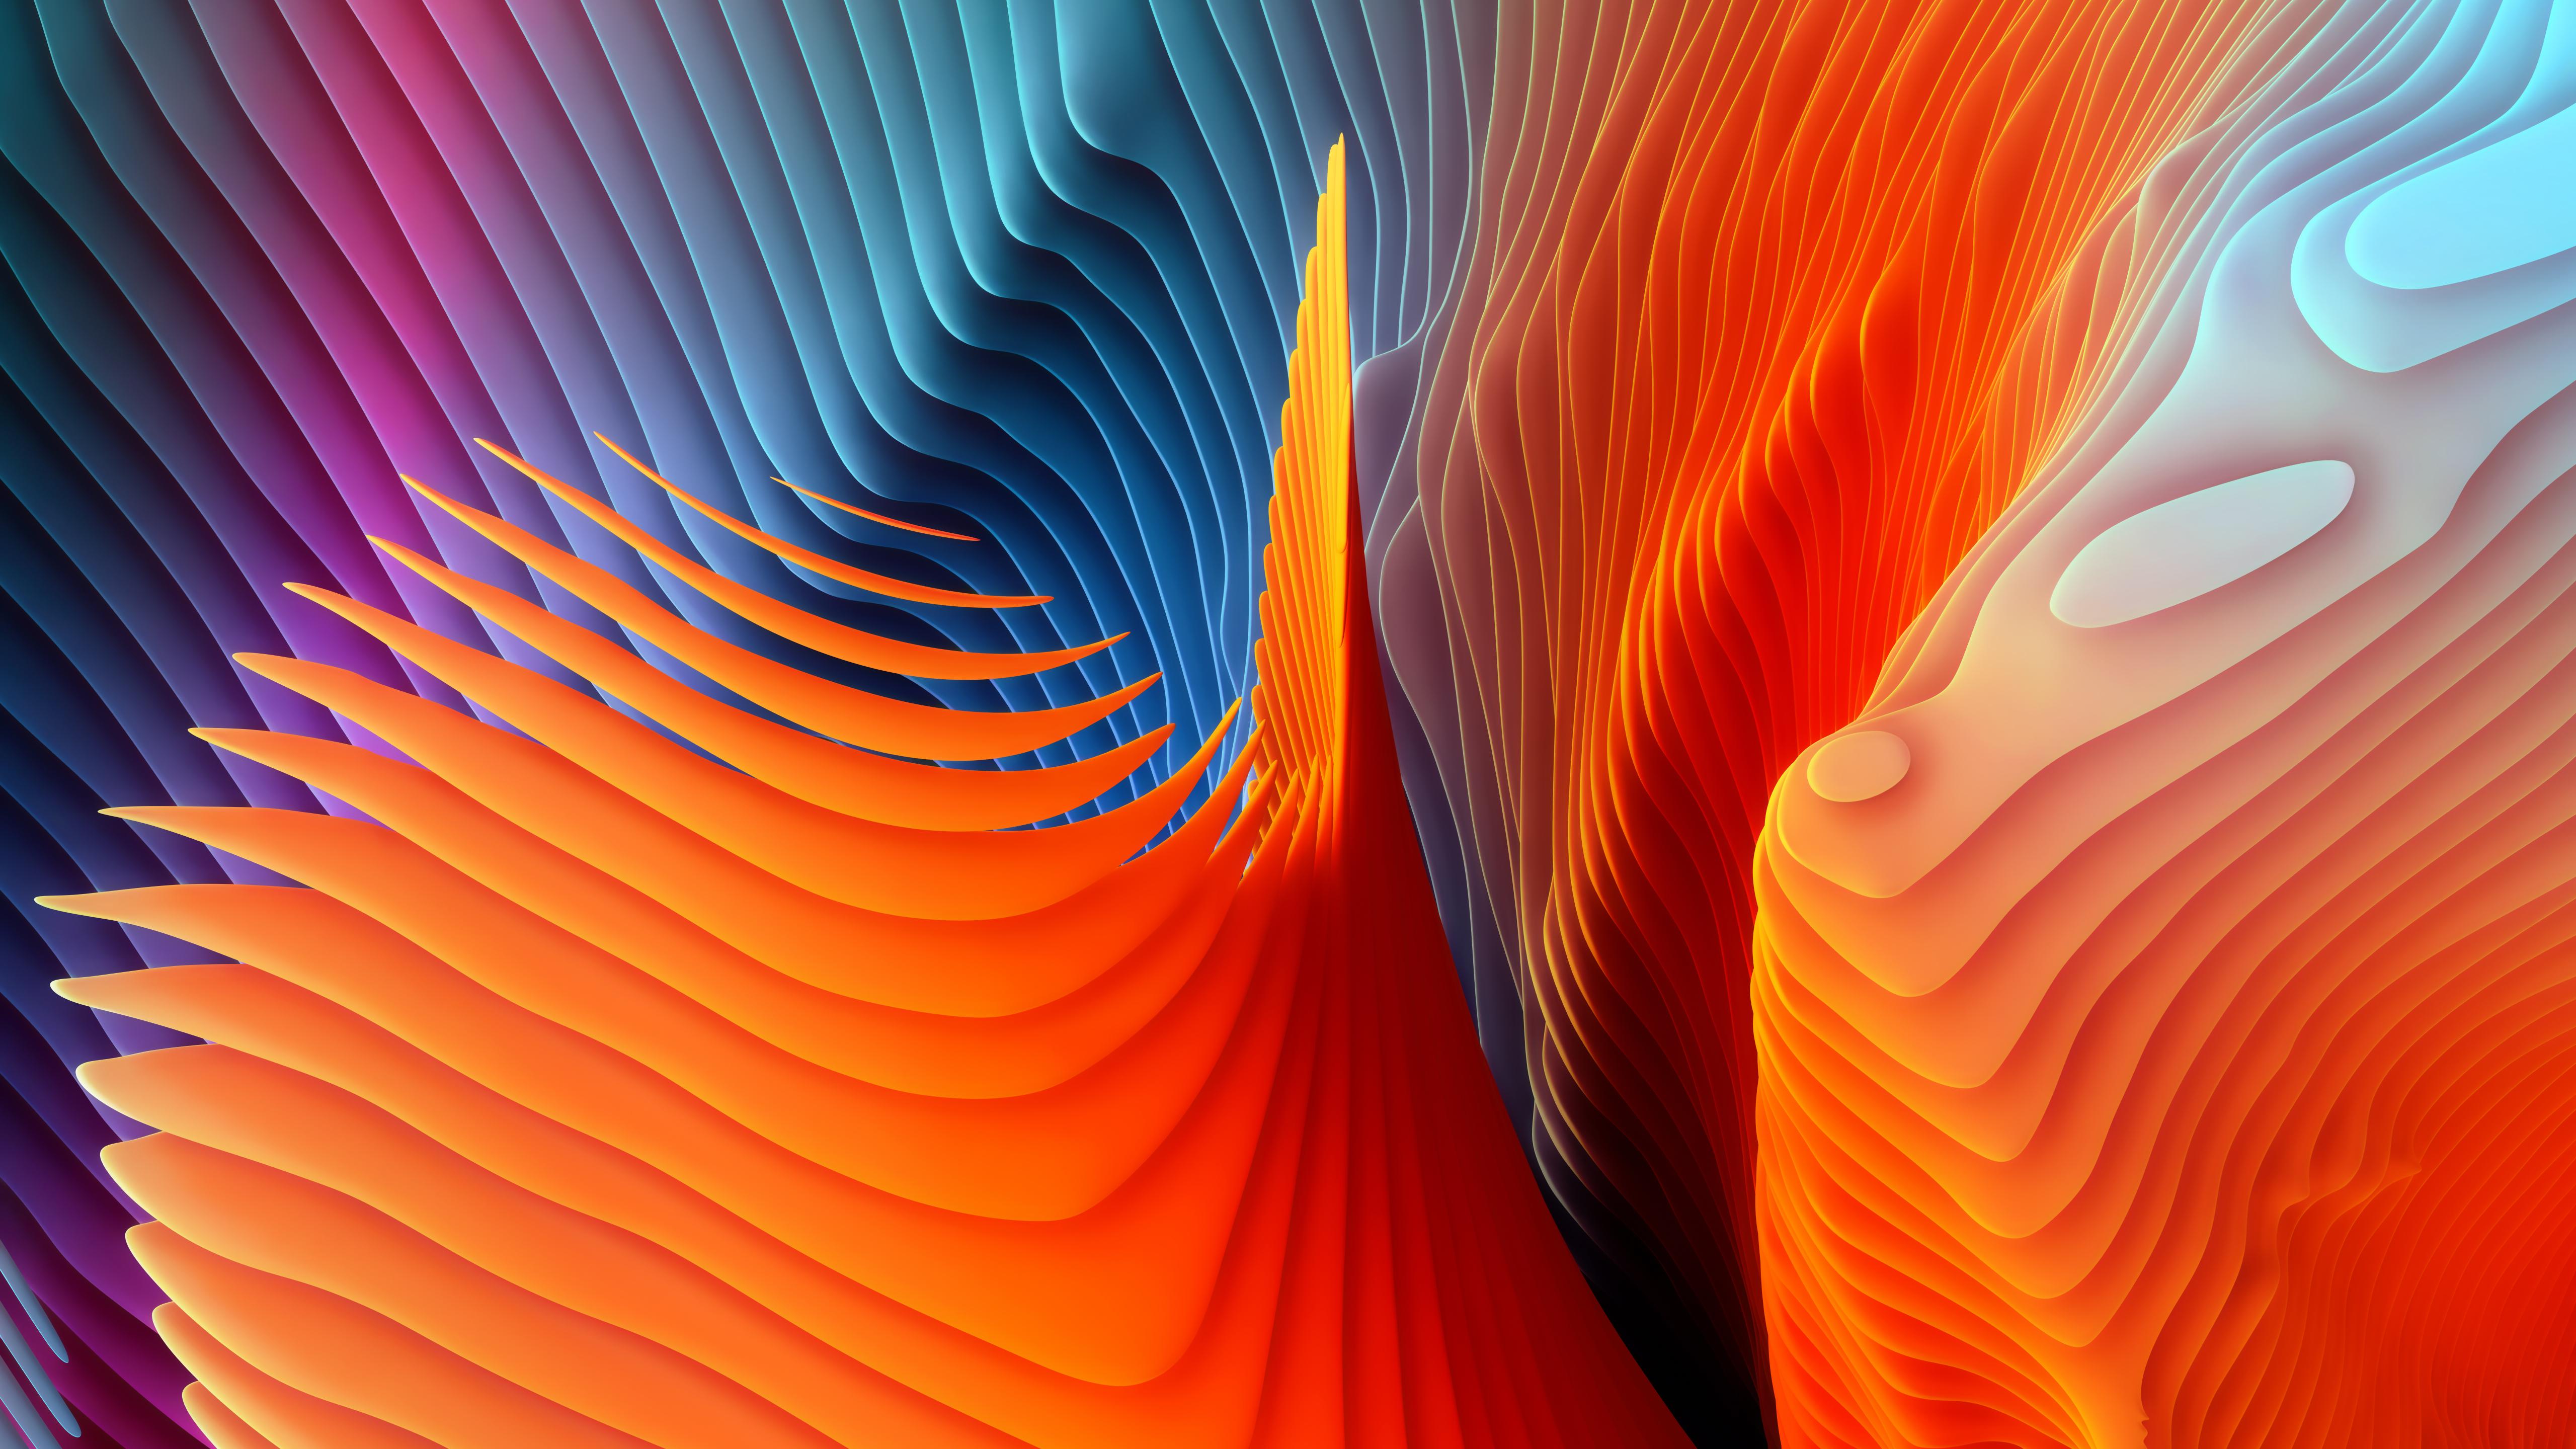 Novo wallpaper do macOS Sierra 10.12.2